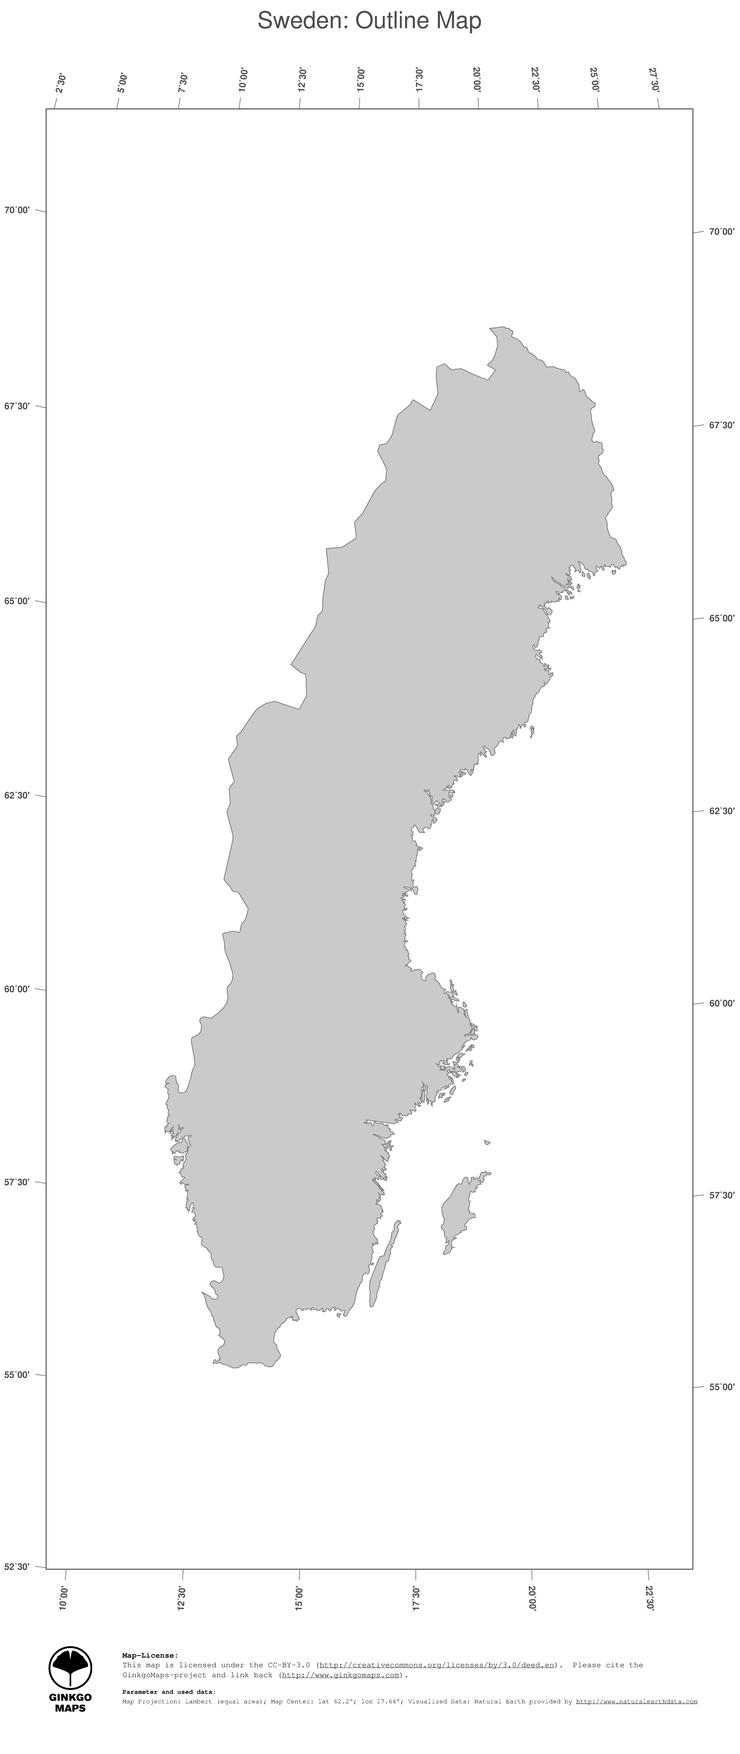 Map Sweden GinkgoMaps Continent Europe Region Sweden - Sweden map of country